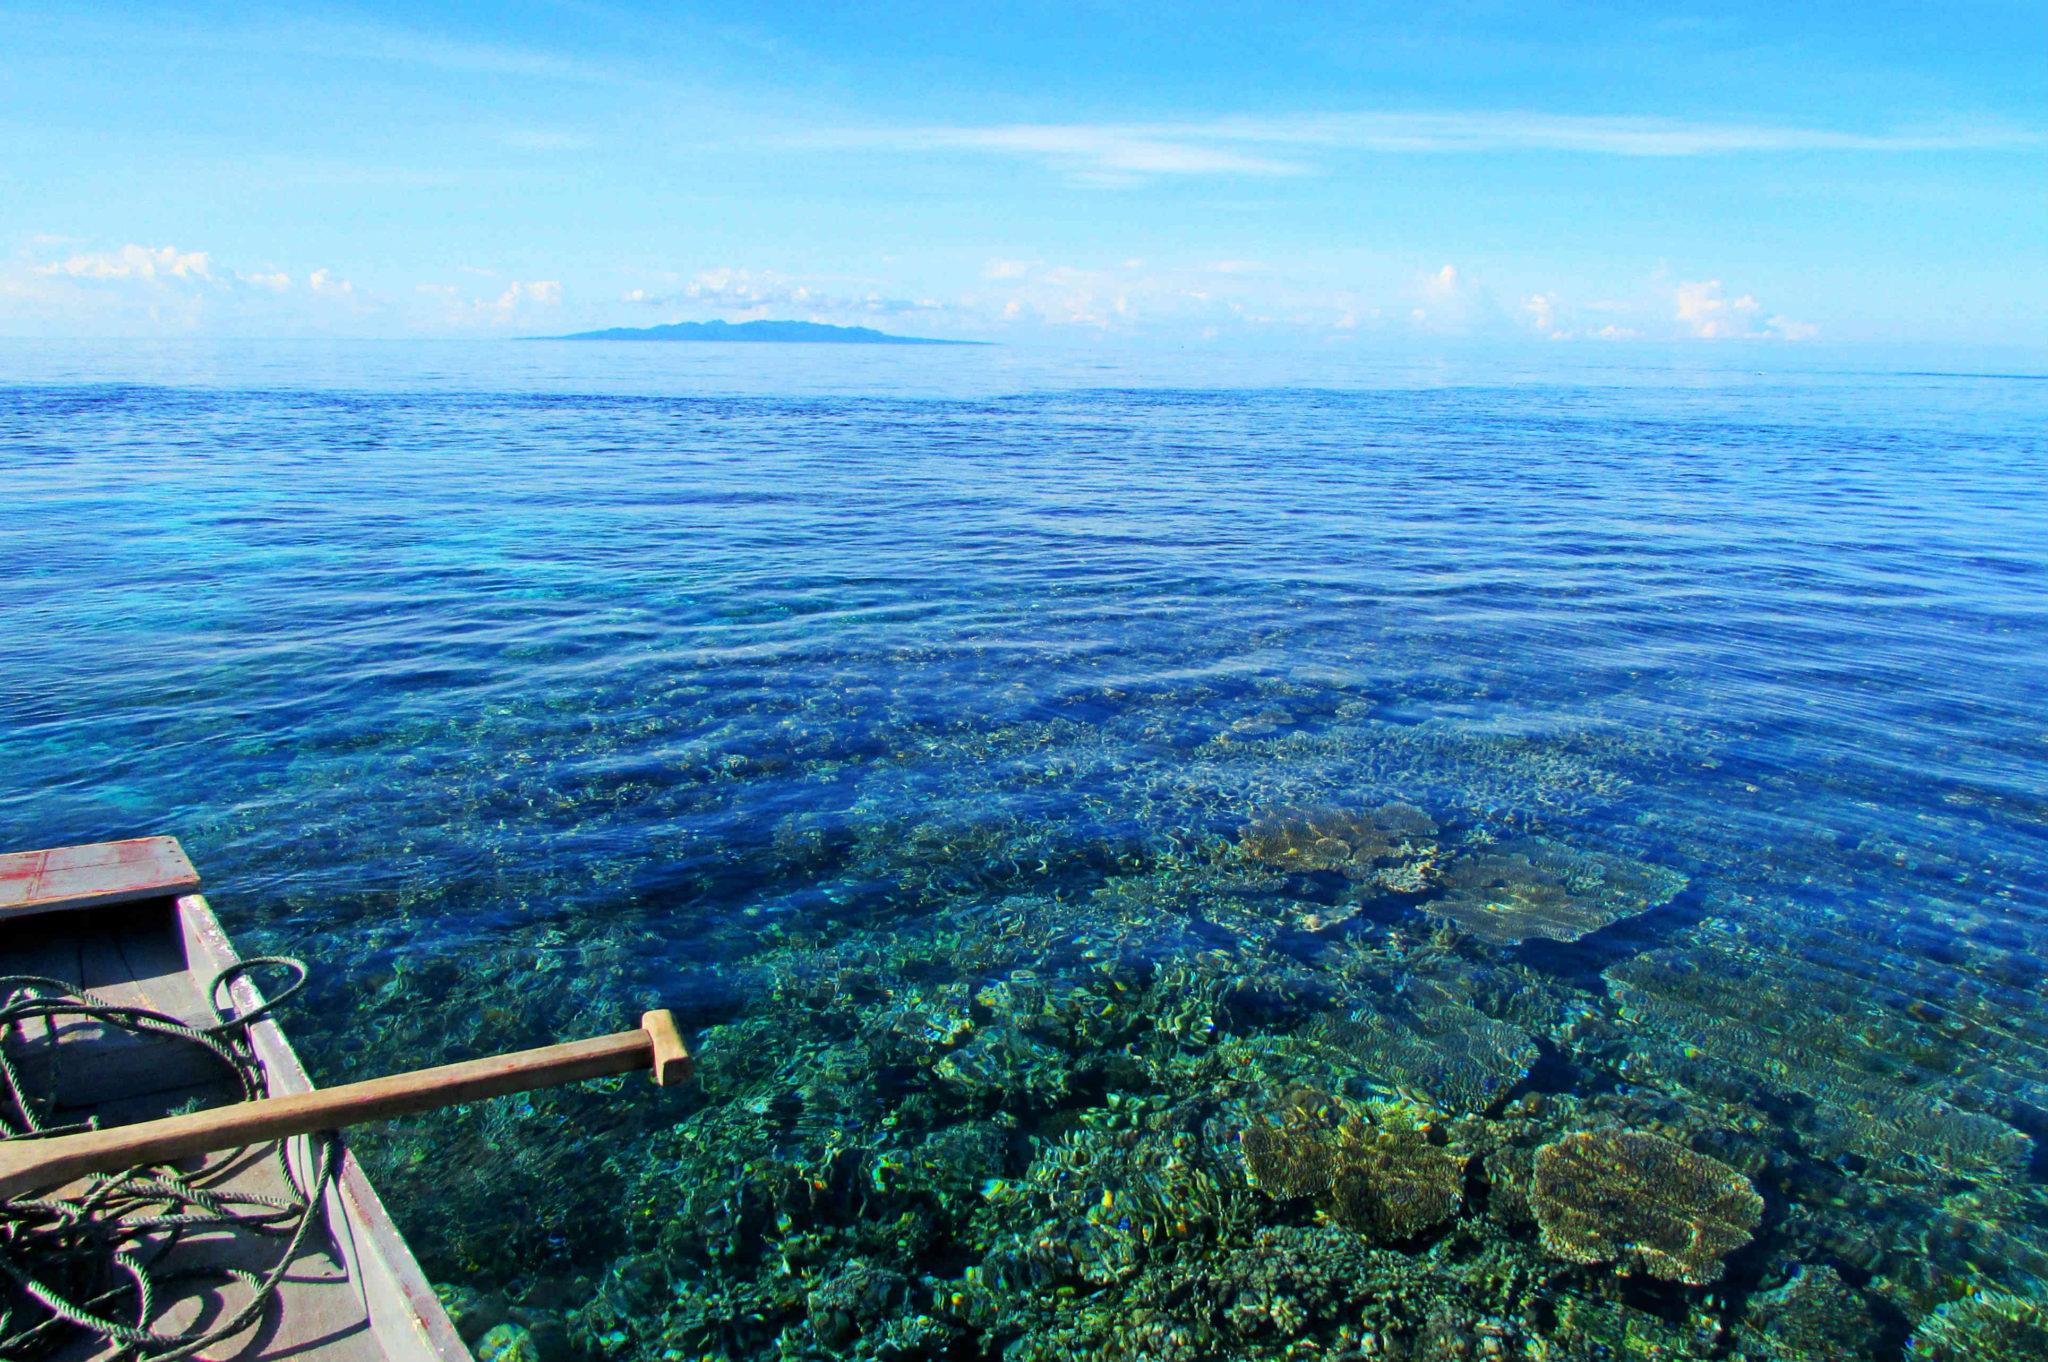 Buceo en Arrecifes en las Isla Togian